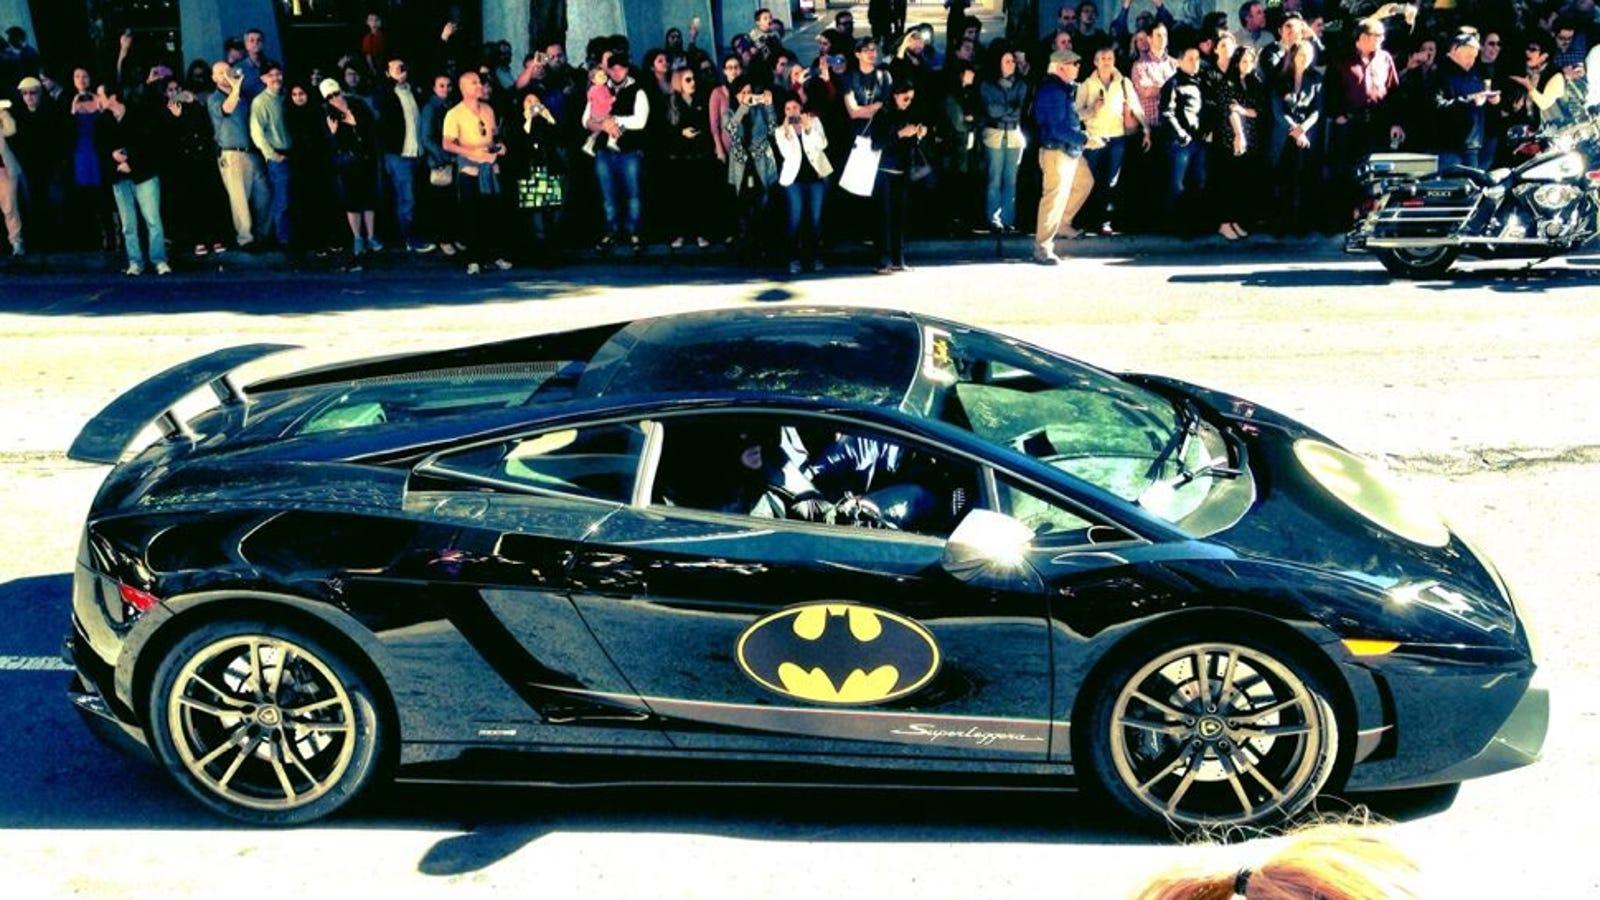 Lamborghini San Francisco >> Make A Wish Helps Batkid Takes Over San Francisco With